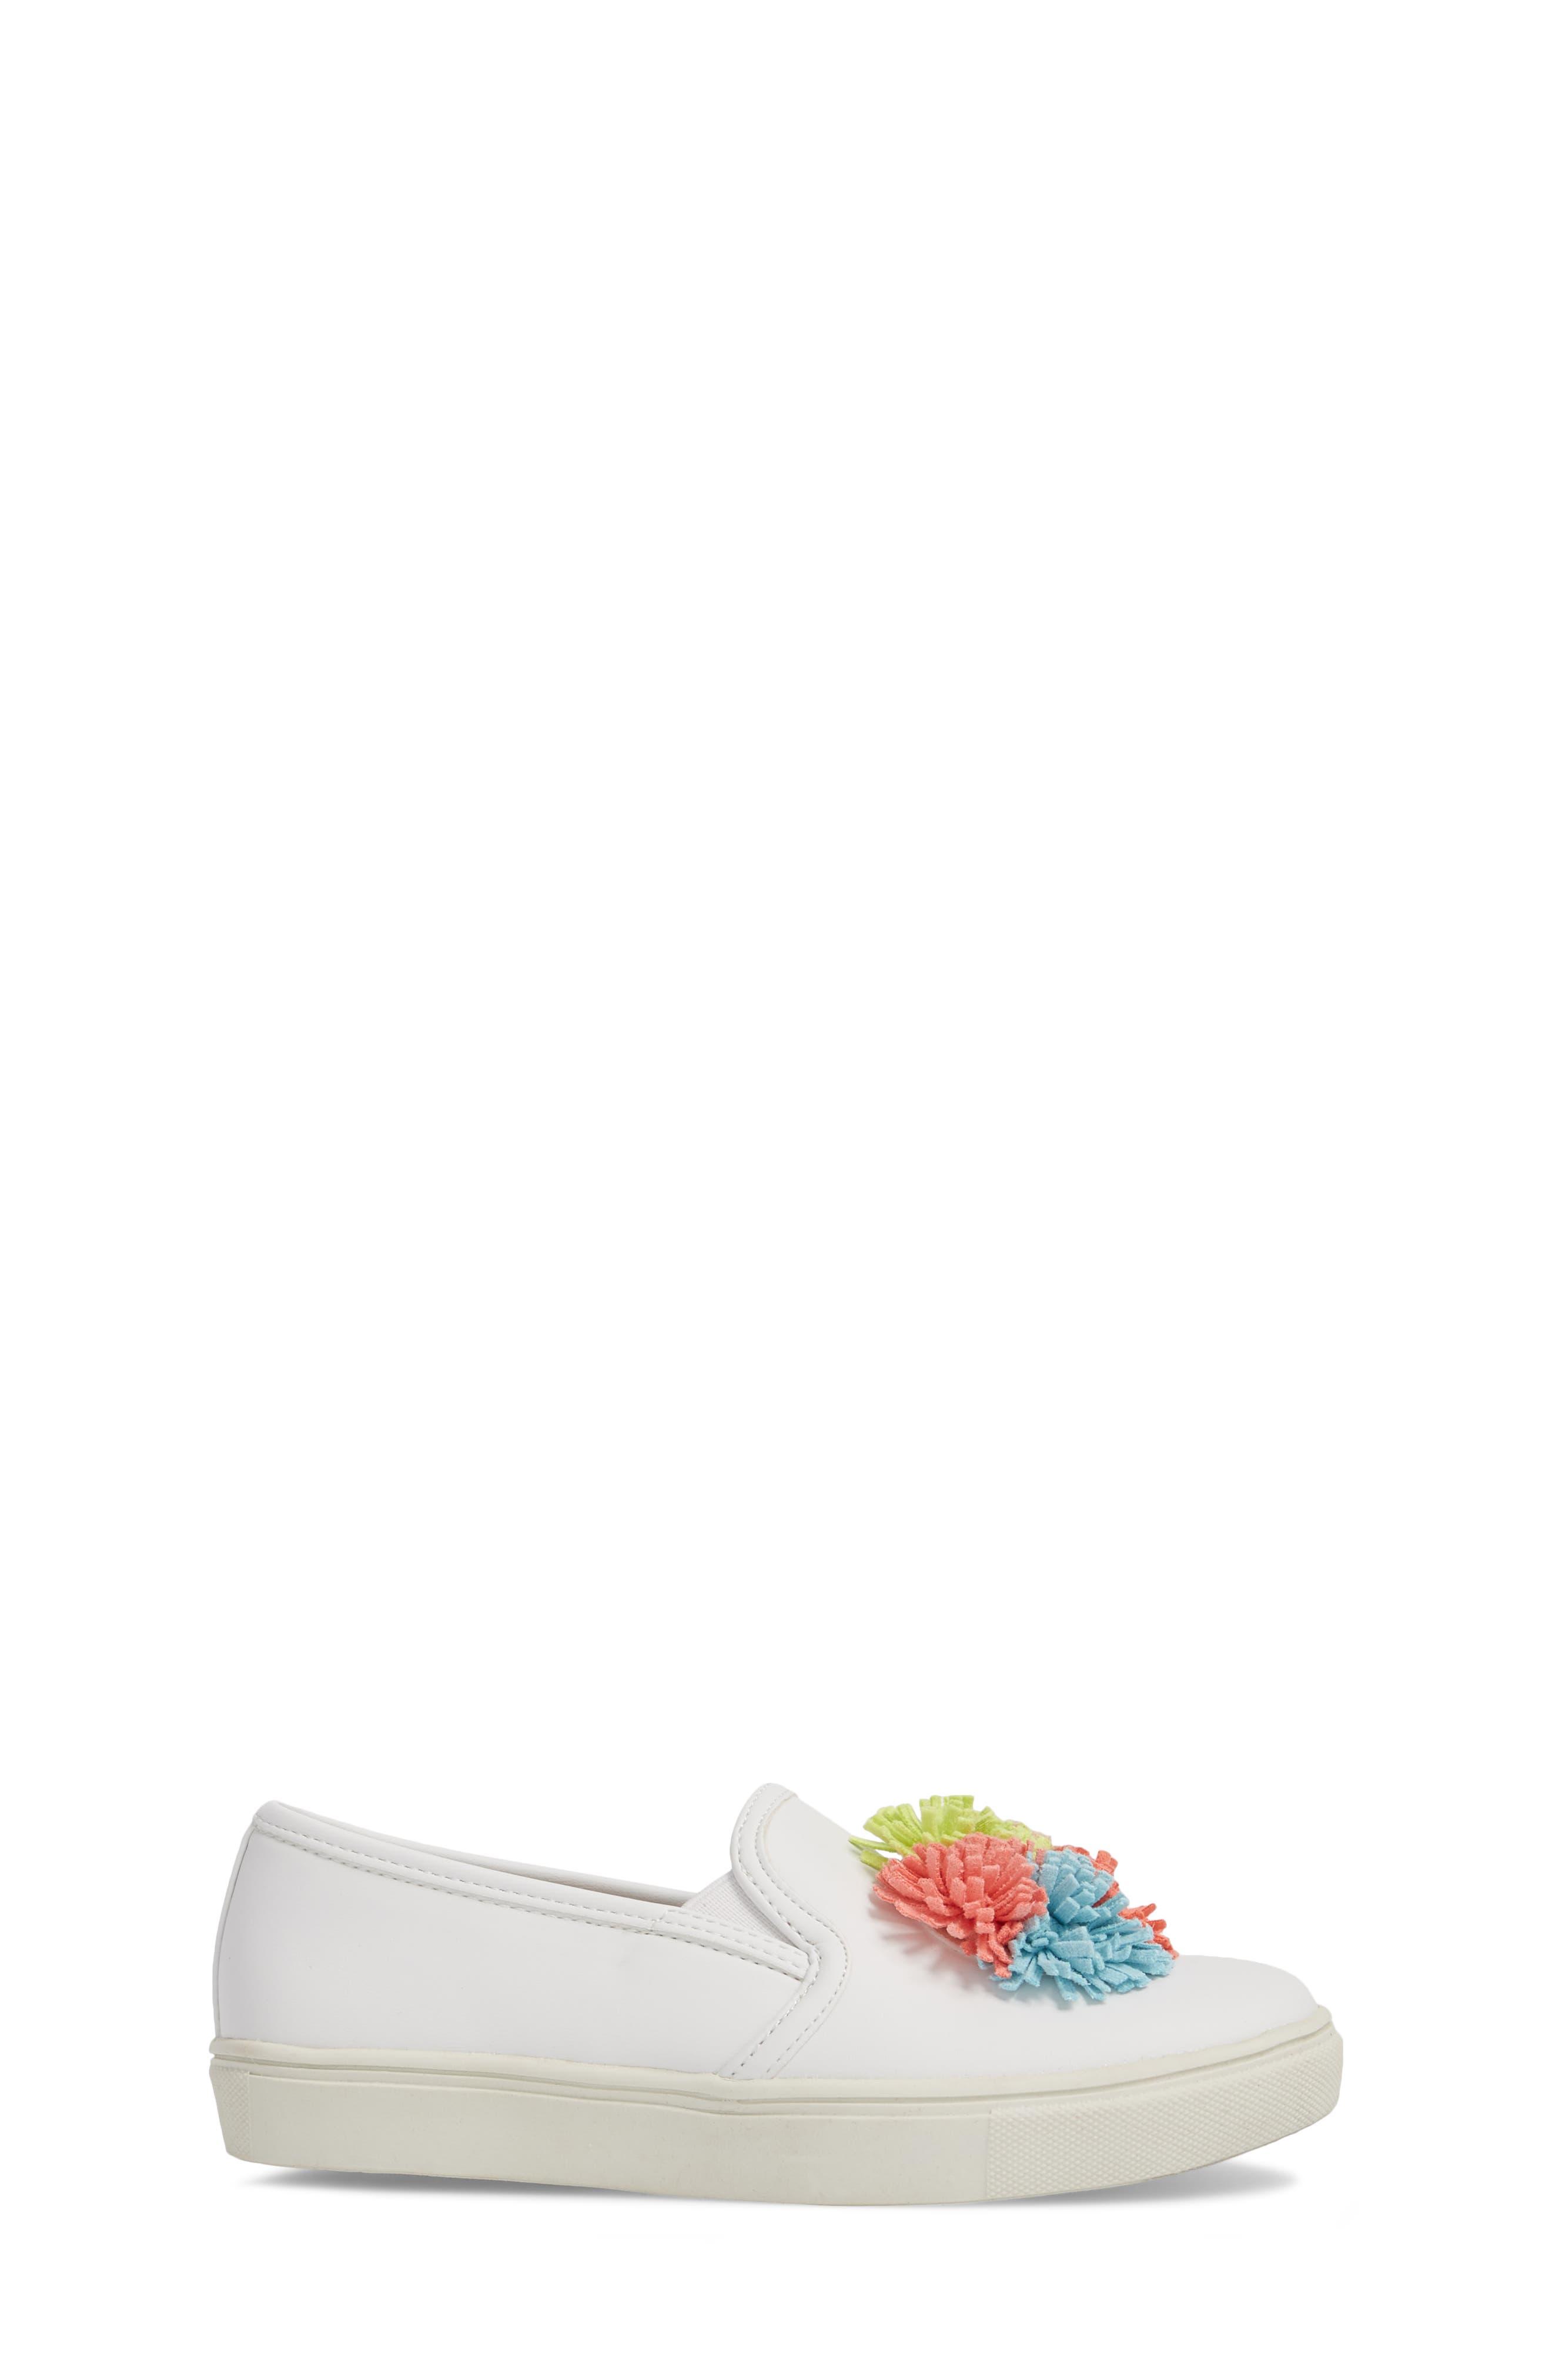 Twiny Pompom Slip-On Sneaker,                             Alternate thumbnail 3, color,                             100